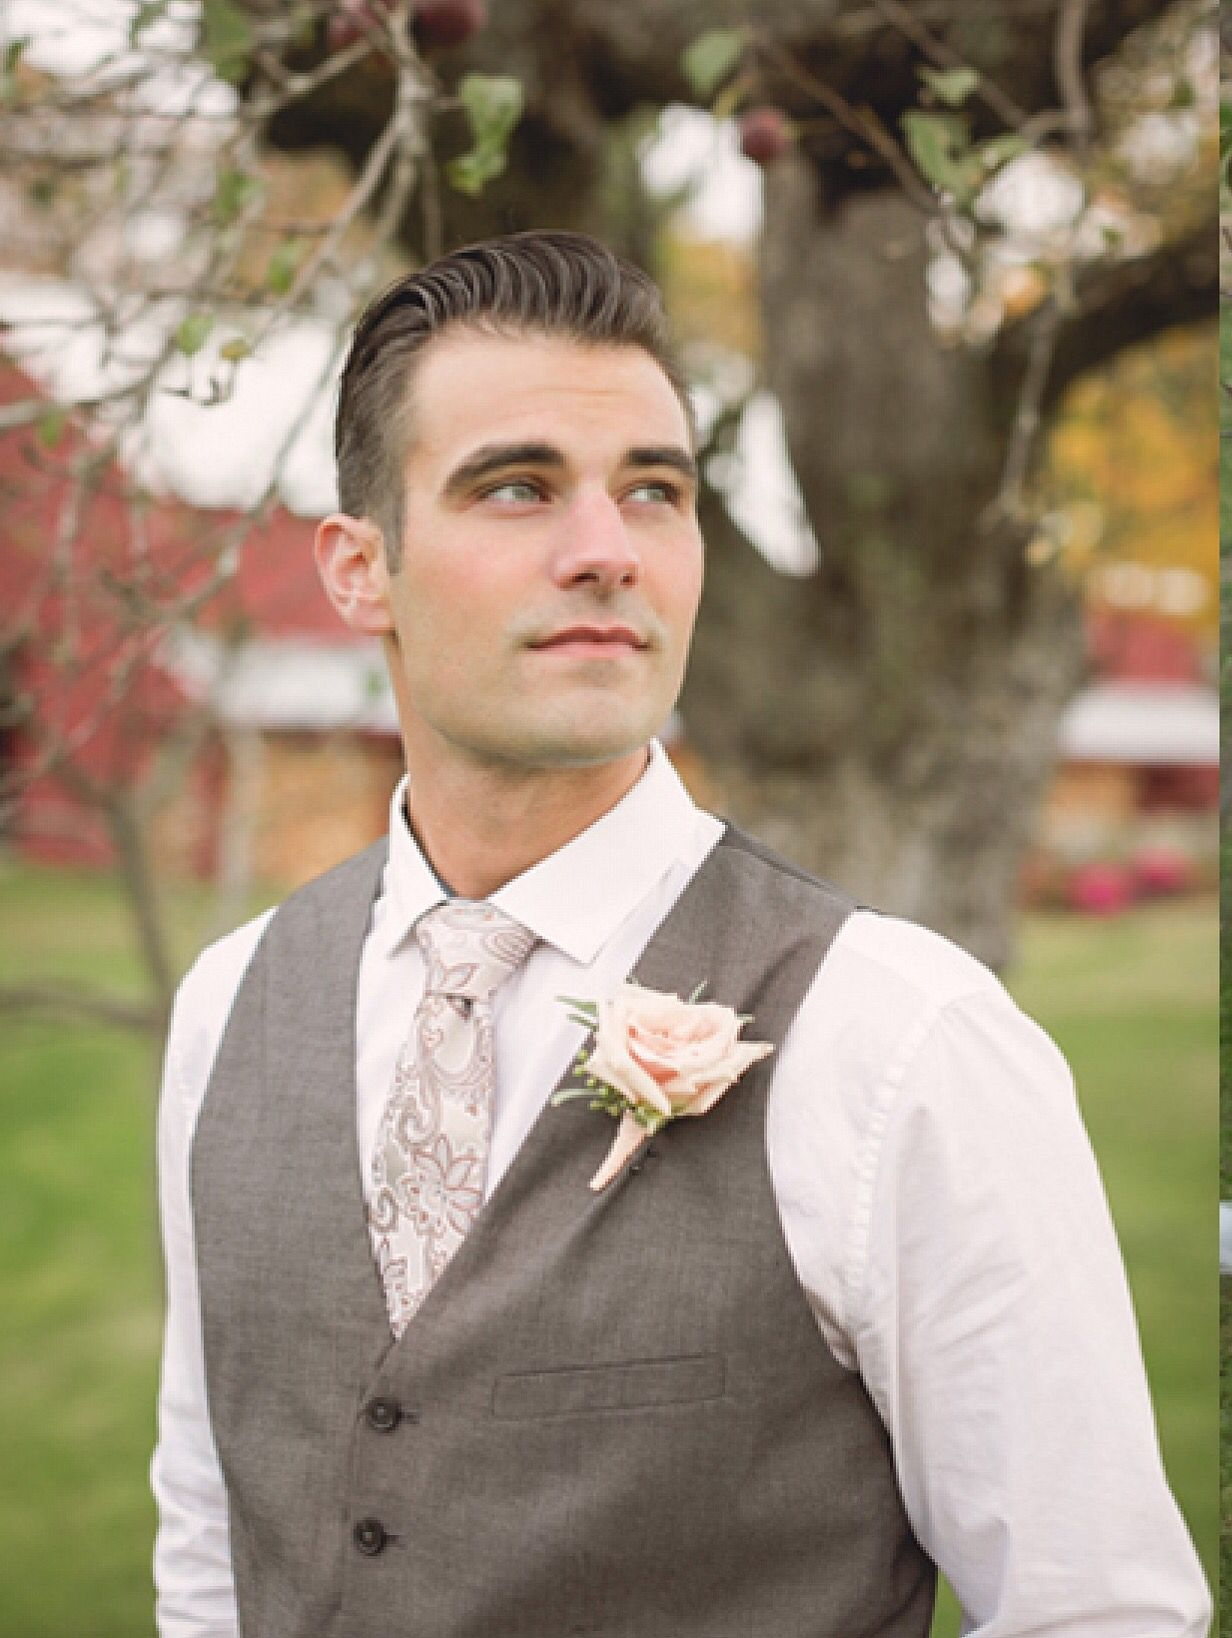 #modeling #malemodel #maine #mainemodeling #portlandmodelsandtalent #weddingshoot #wedding #mainemag #mainemagazine #featured  http://themainemag.com/weddings/wedding-features.html